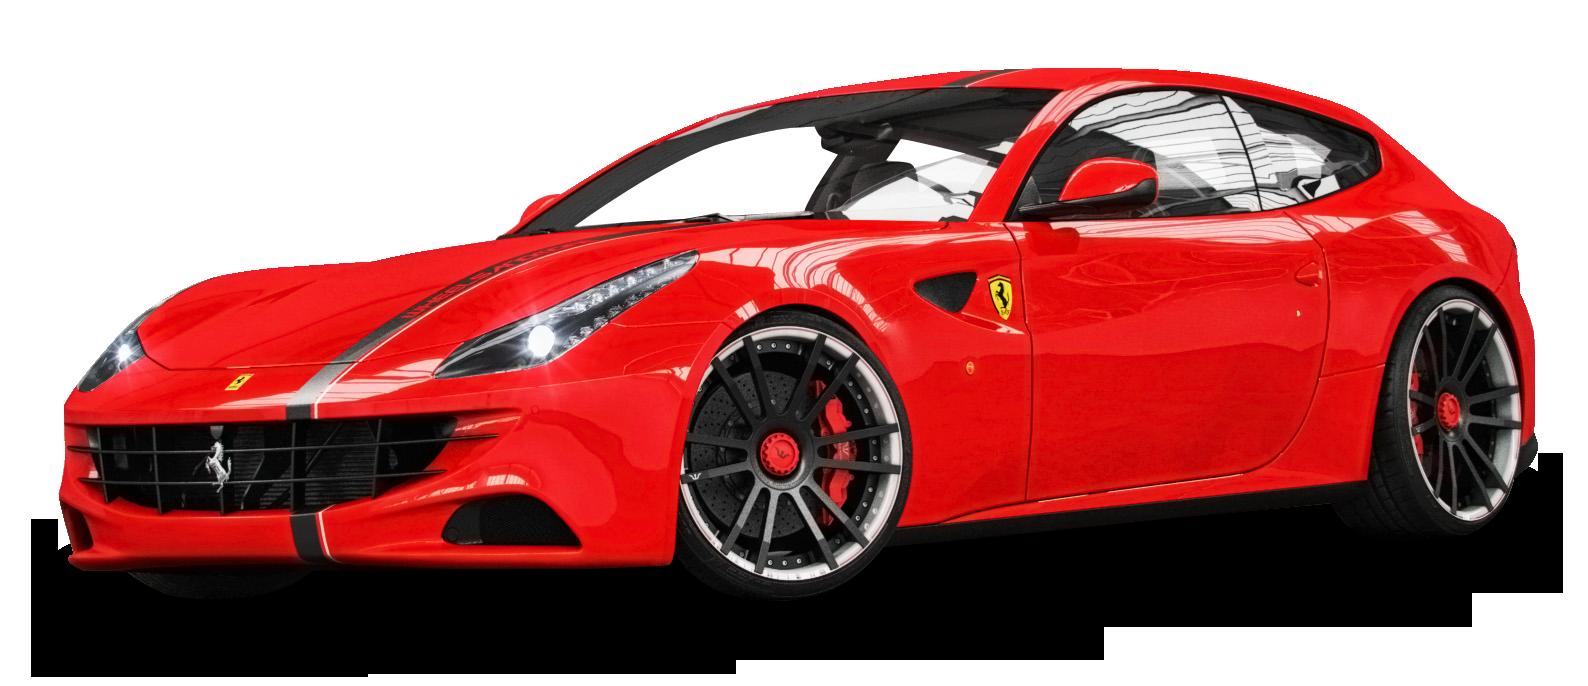 Ferrari Red Car Png Image Red Car Car Ferrari